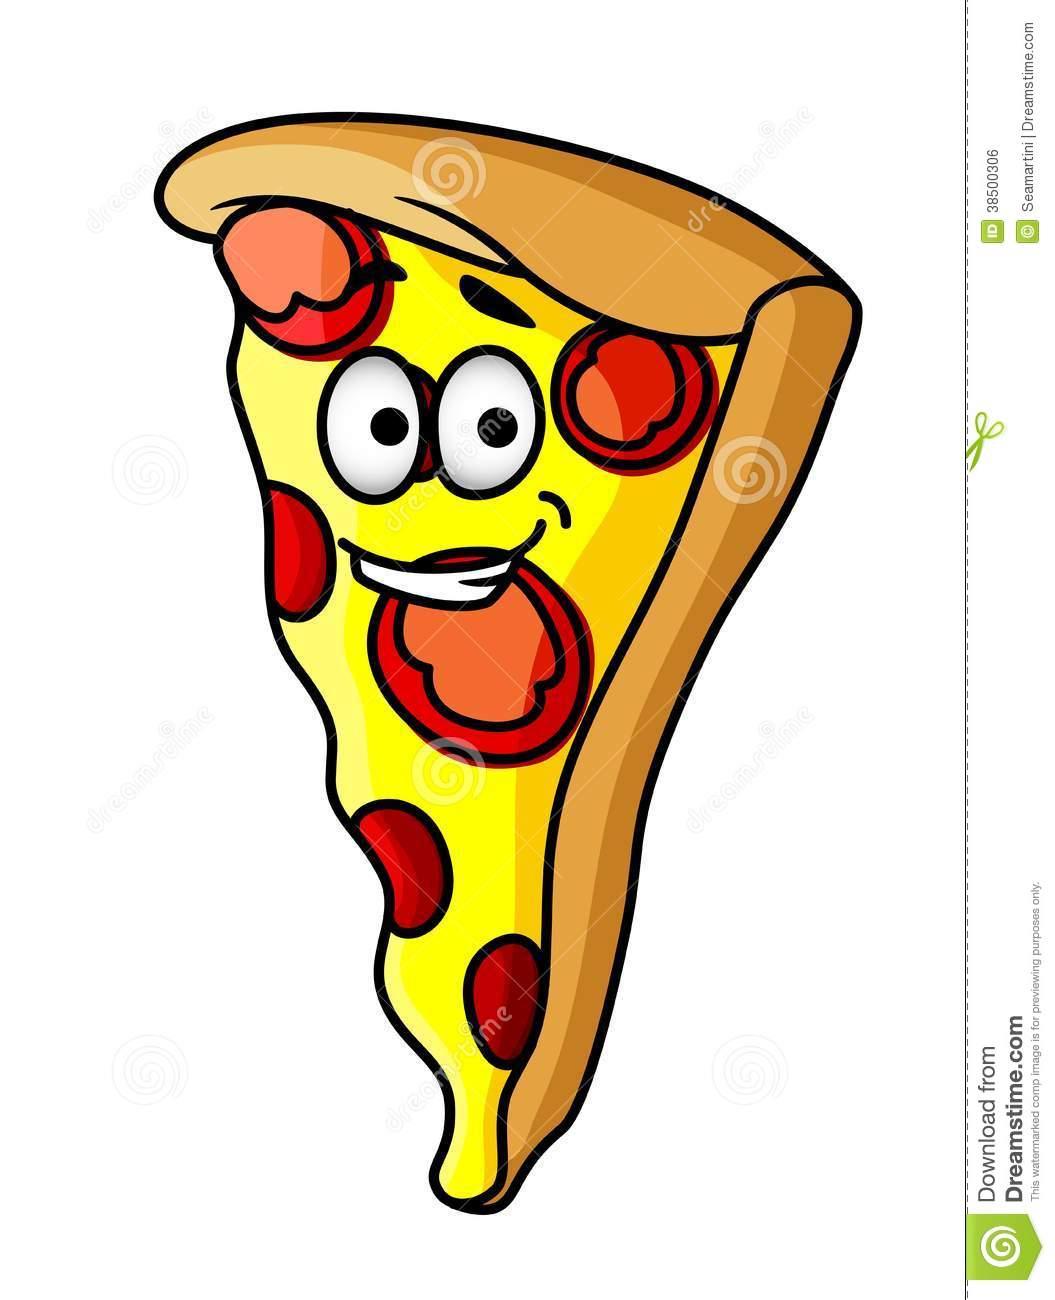 pepperoni pizza clip art clipart panda free clipart images rh clipartpanda com Plain Pizza Clip Art pepperoni pizza clipart free